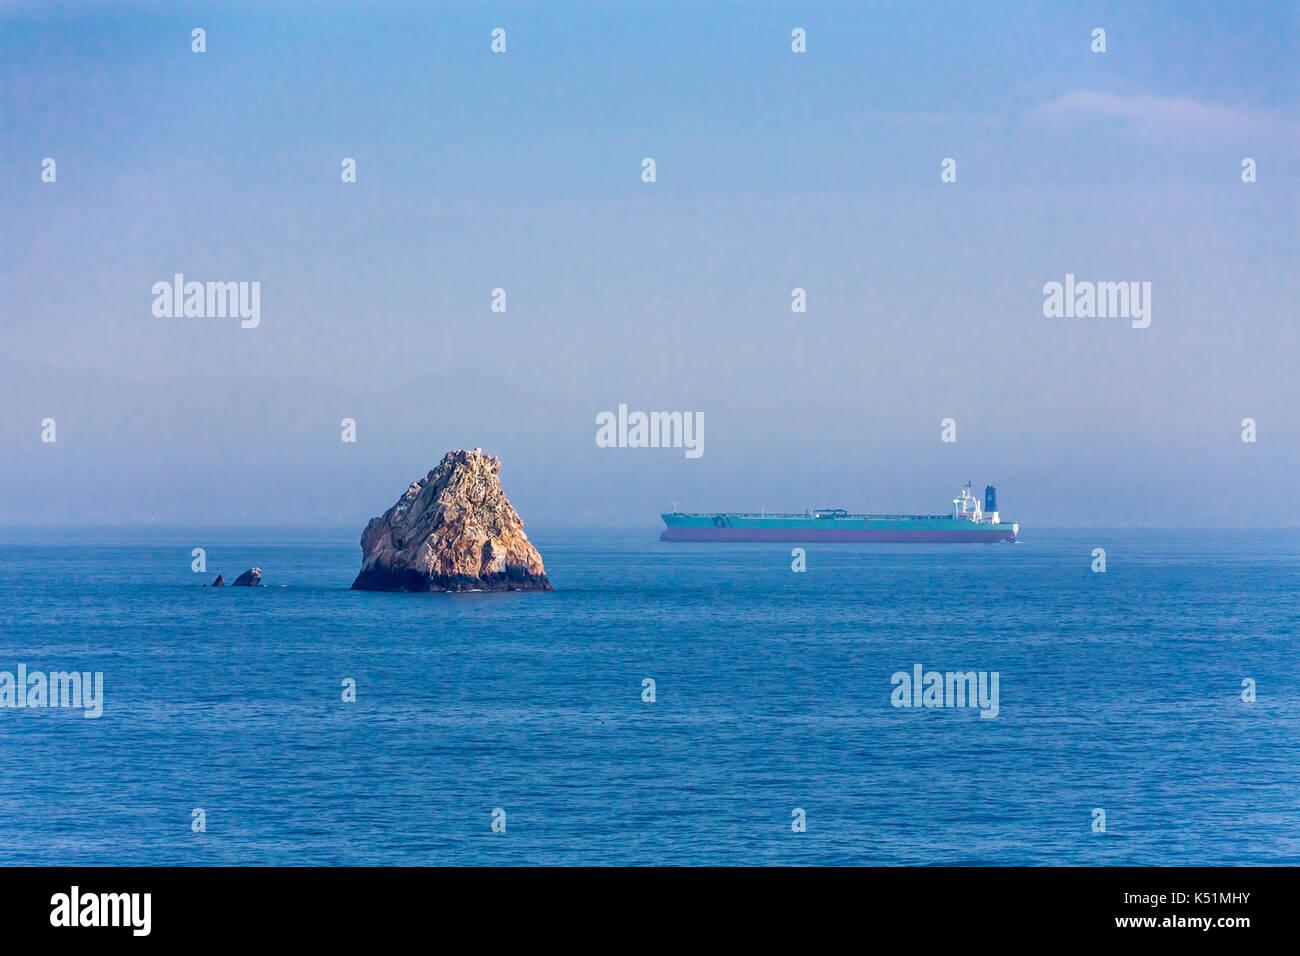 An ocean going cargo ship in the South China Seas, Asia. - Stock Image